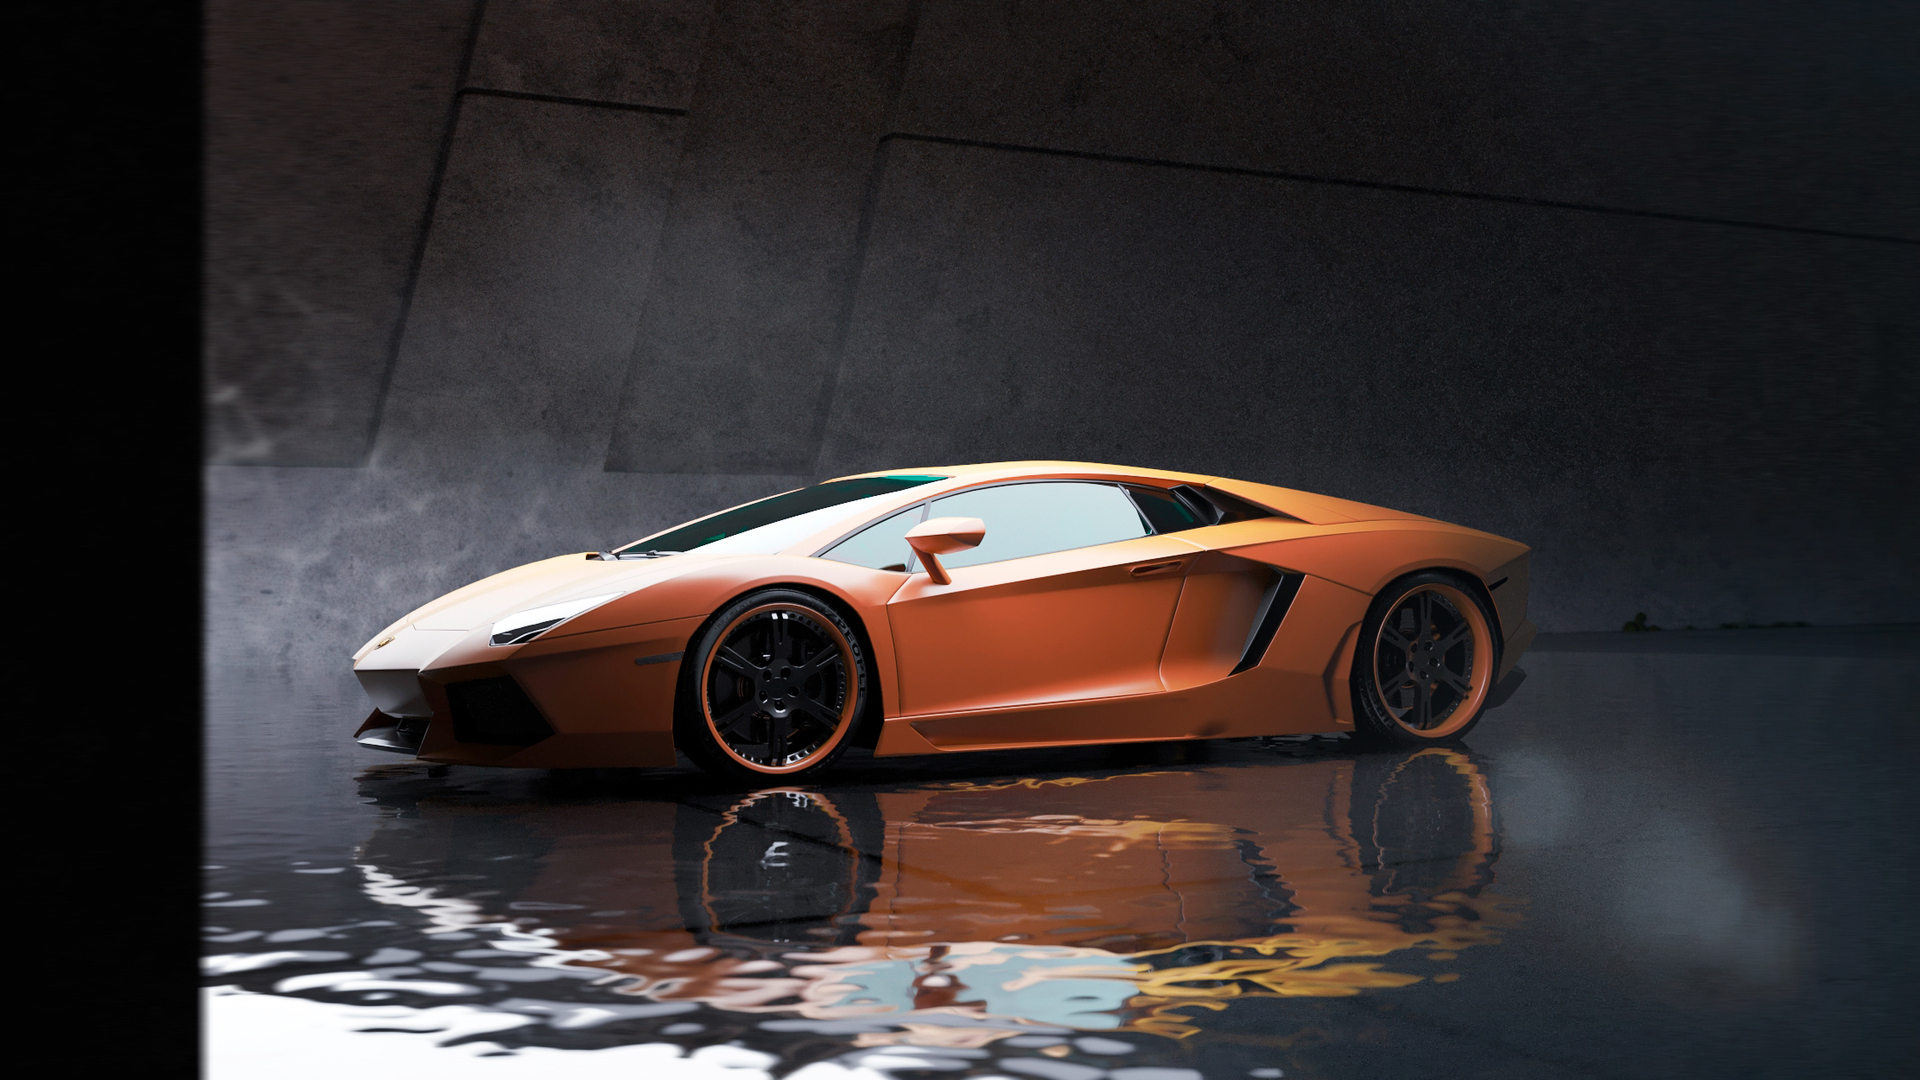 1920x1080 Orange Lamborghini Aventador Car Laptop Full HD ...